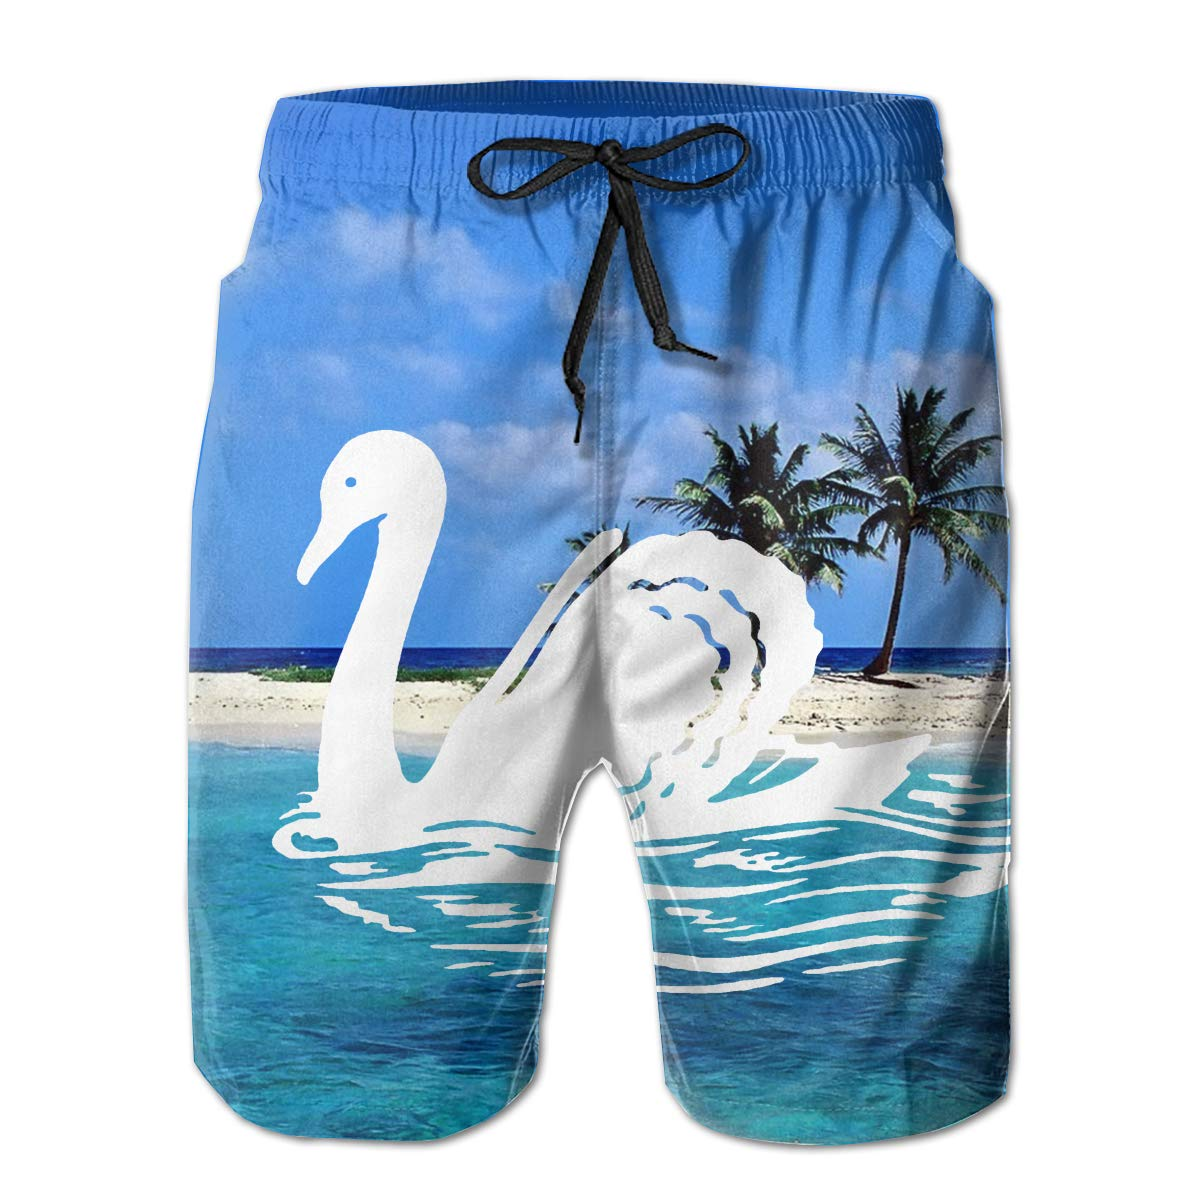 KDSG GSKD Swan Mens Fashion Beach Shorts Quick Dry Swim Trunks Bathing Slips